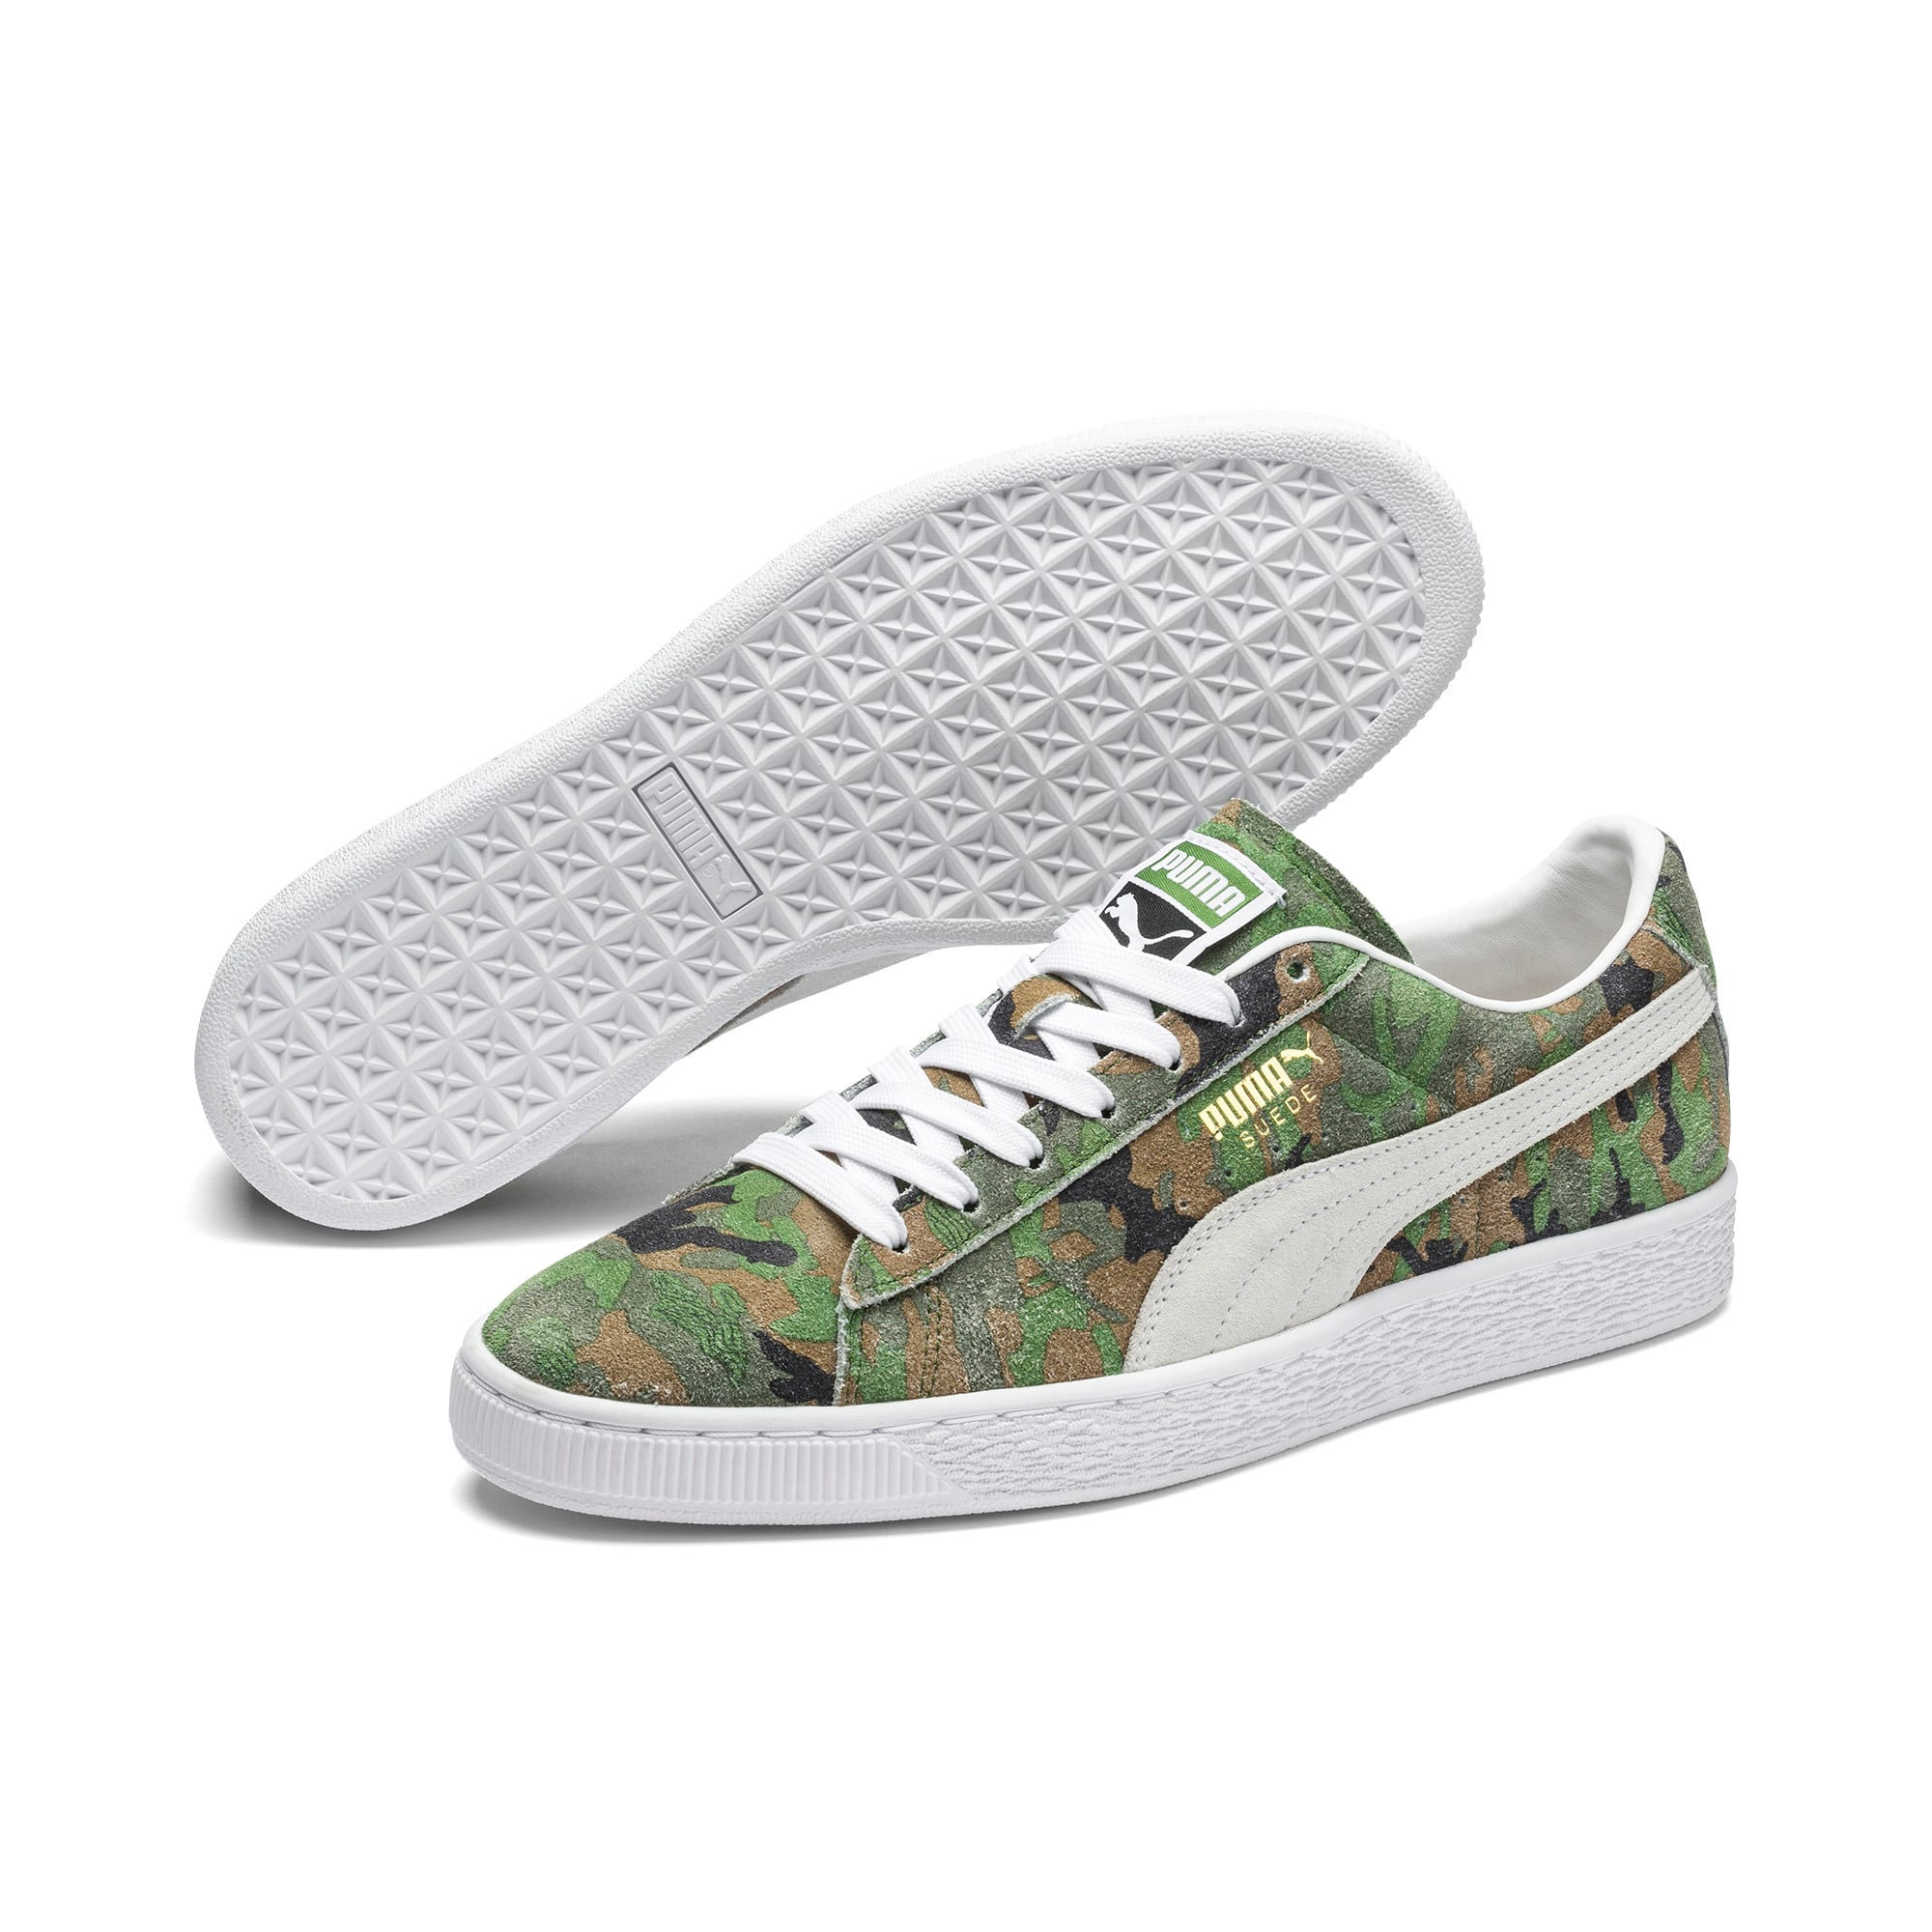 Thumbnail 2 of Suede Classic Ambush Sneakers, Dachsund-Green-Black-White, medium